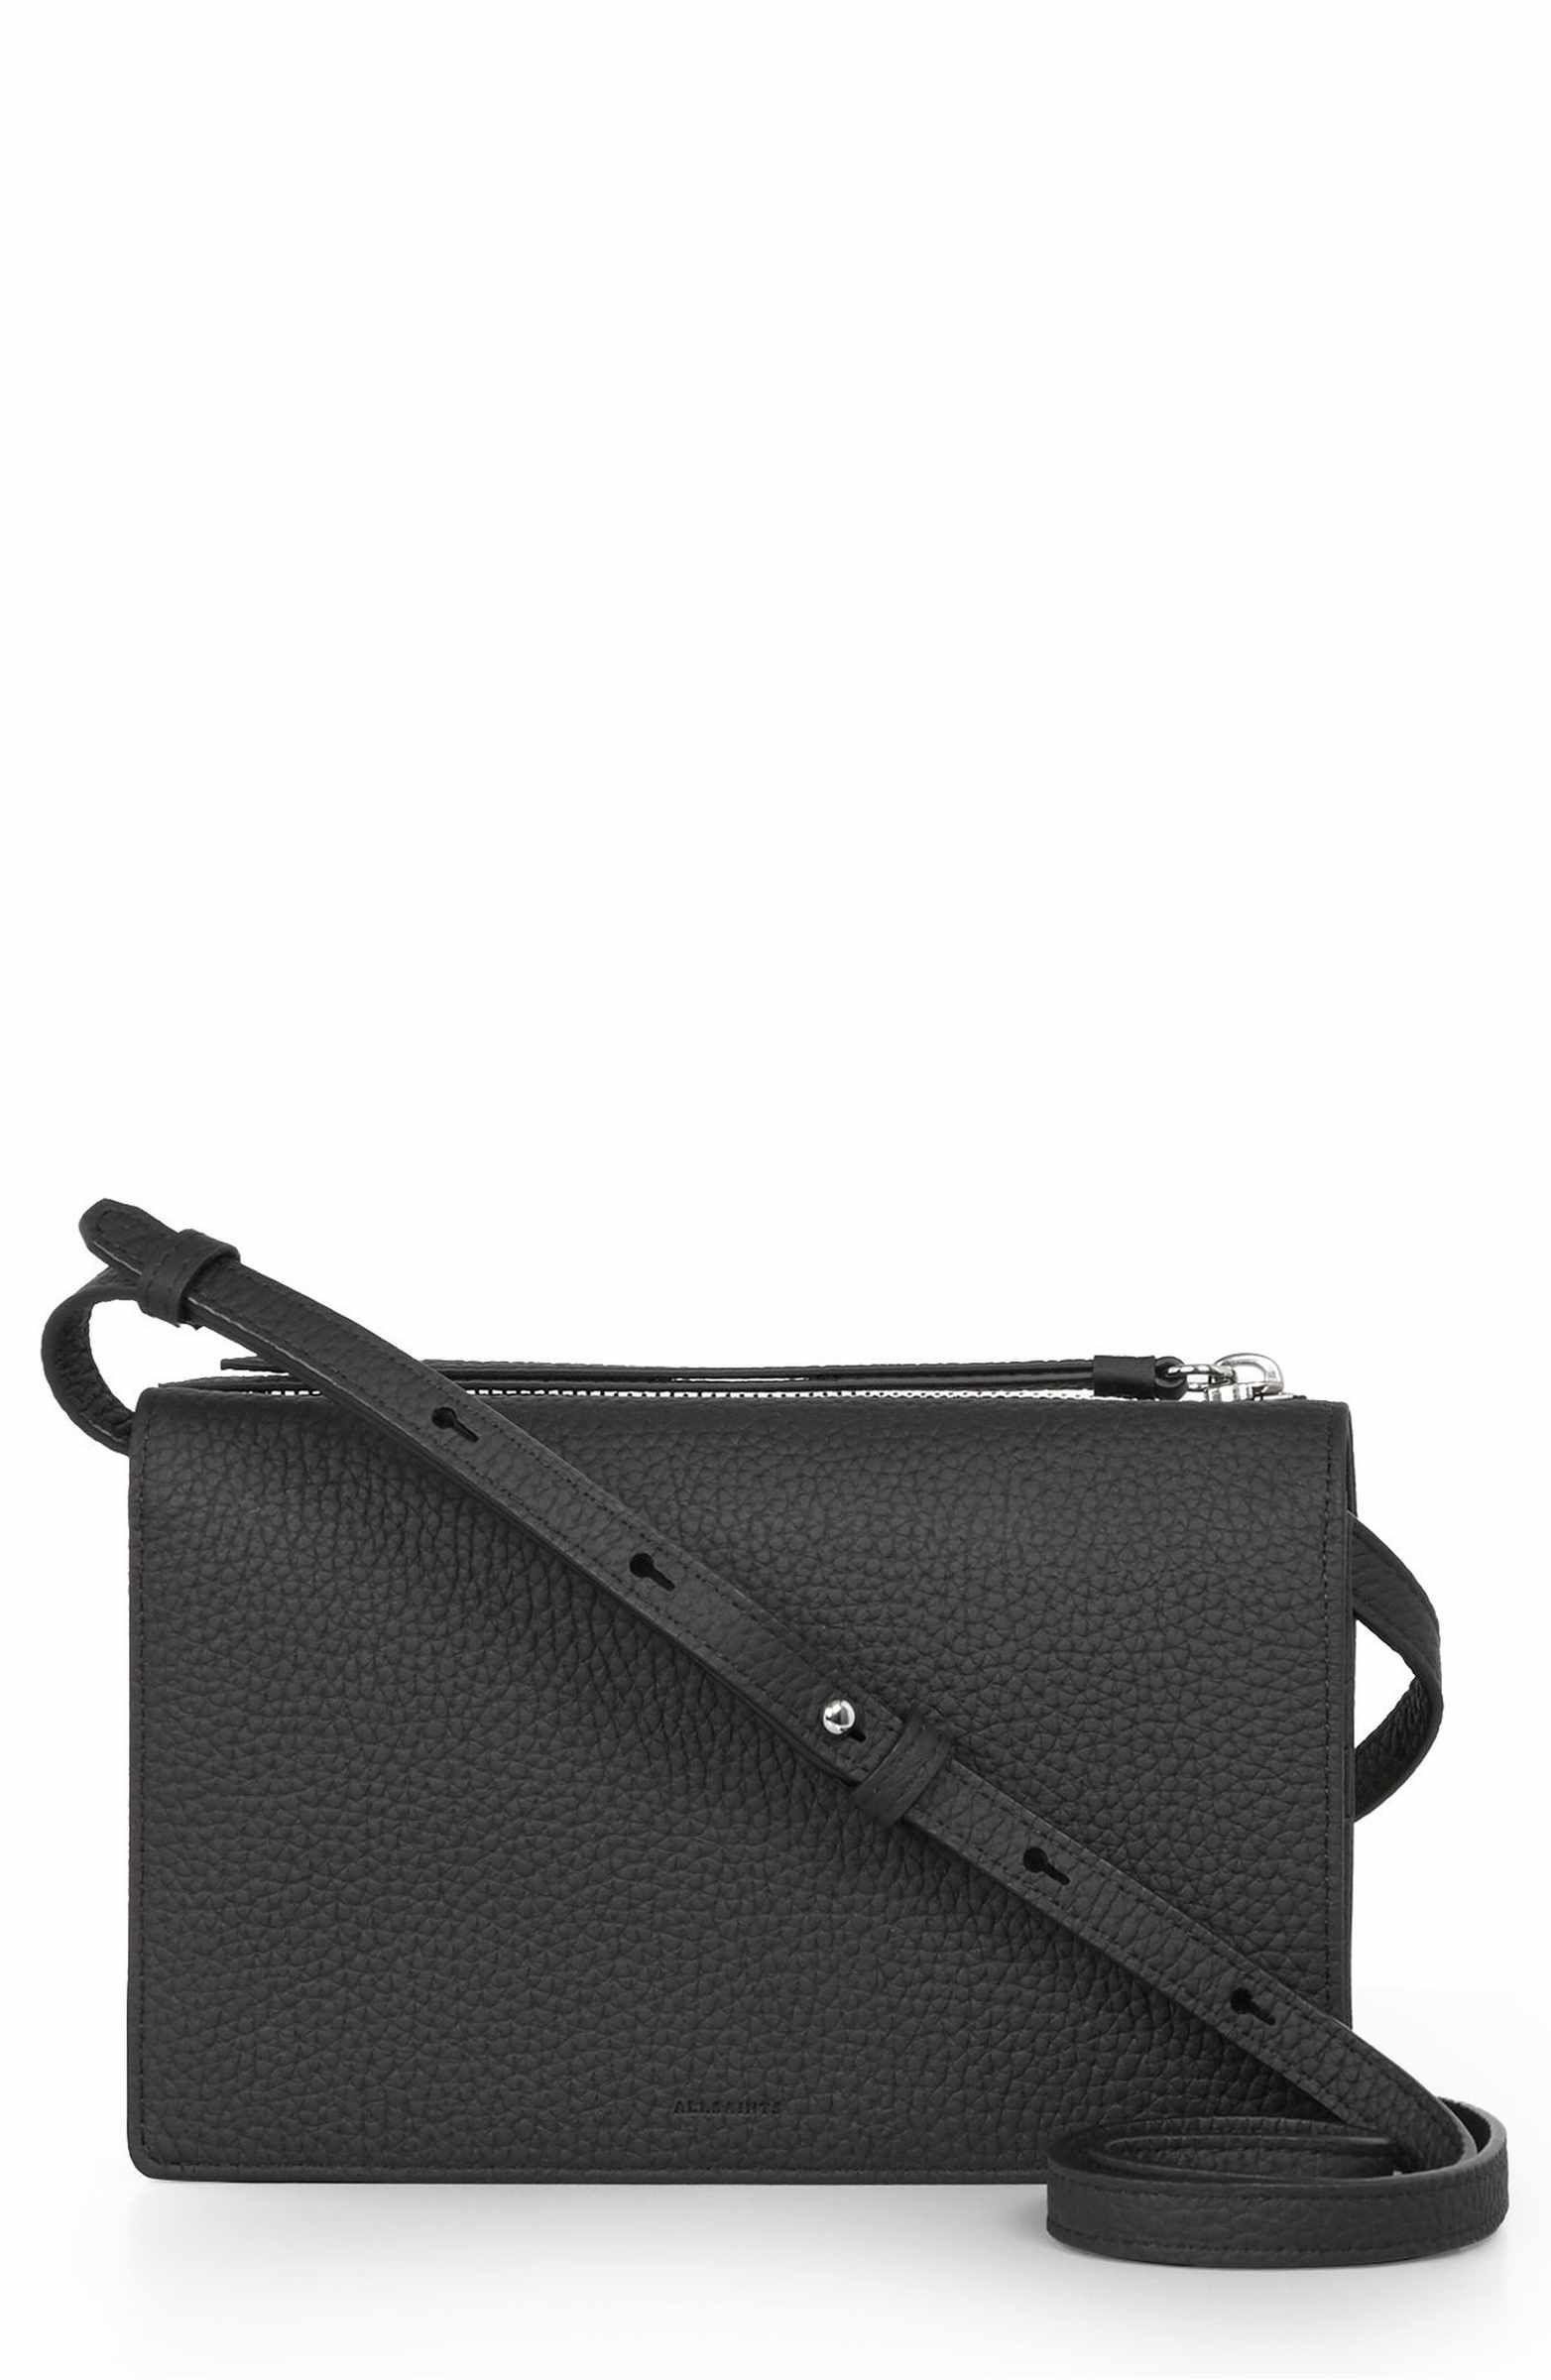 iphone purse crossbody nordstrom